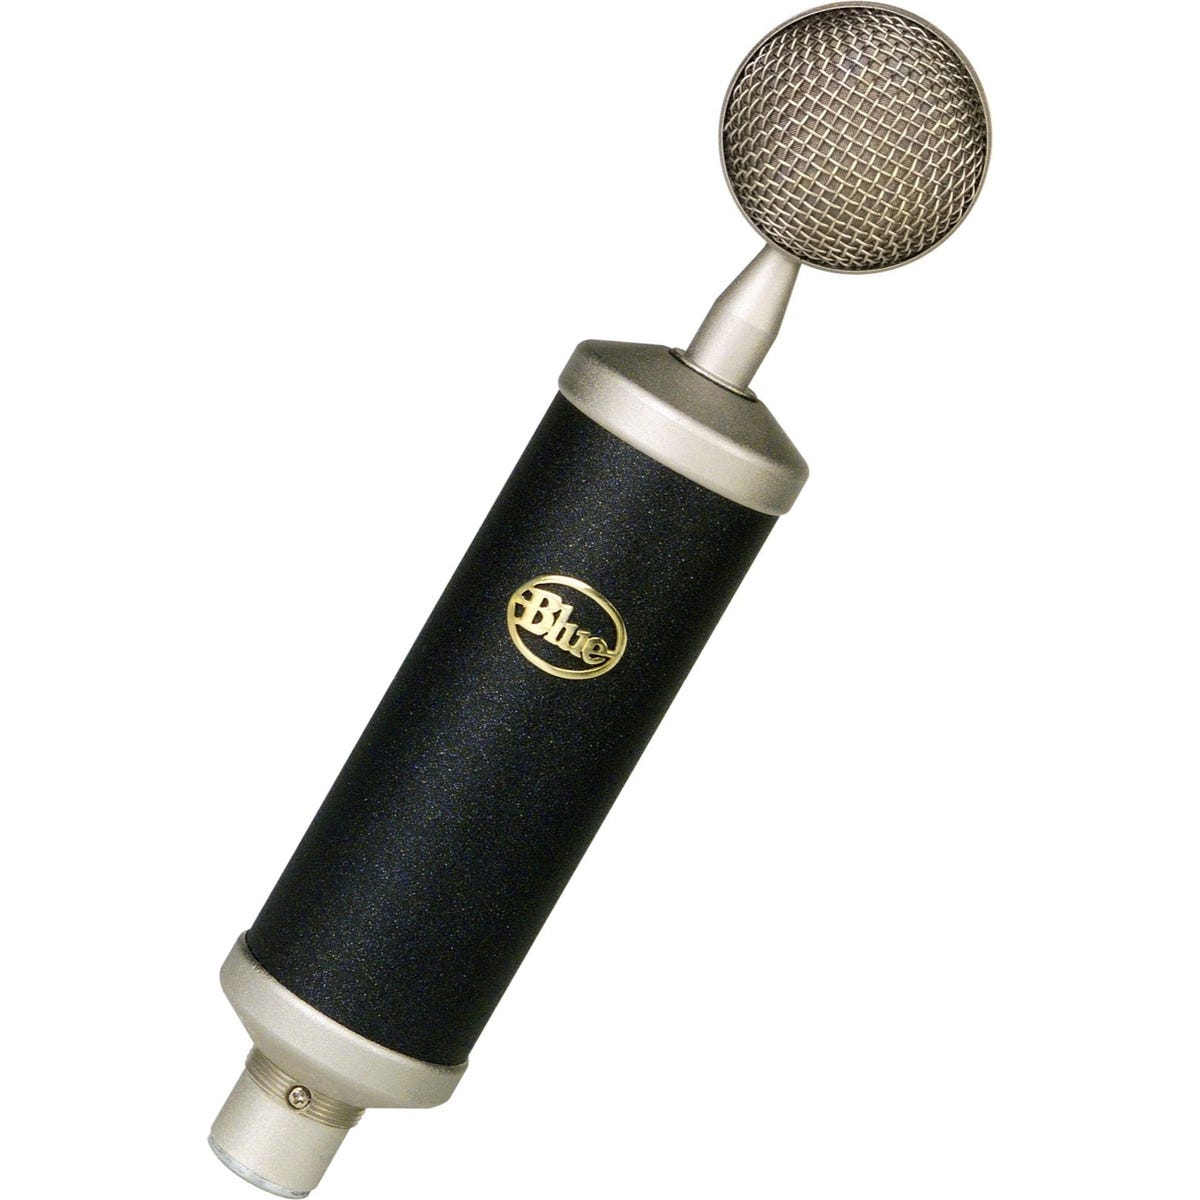 Blue Microphones Baby Bottle SL Condenser microphone